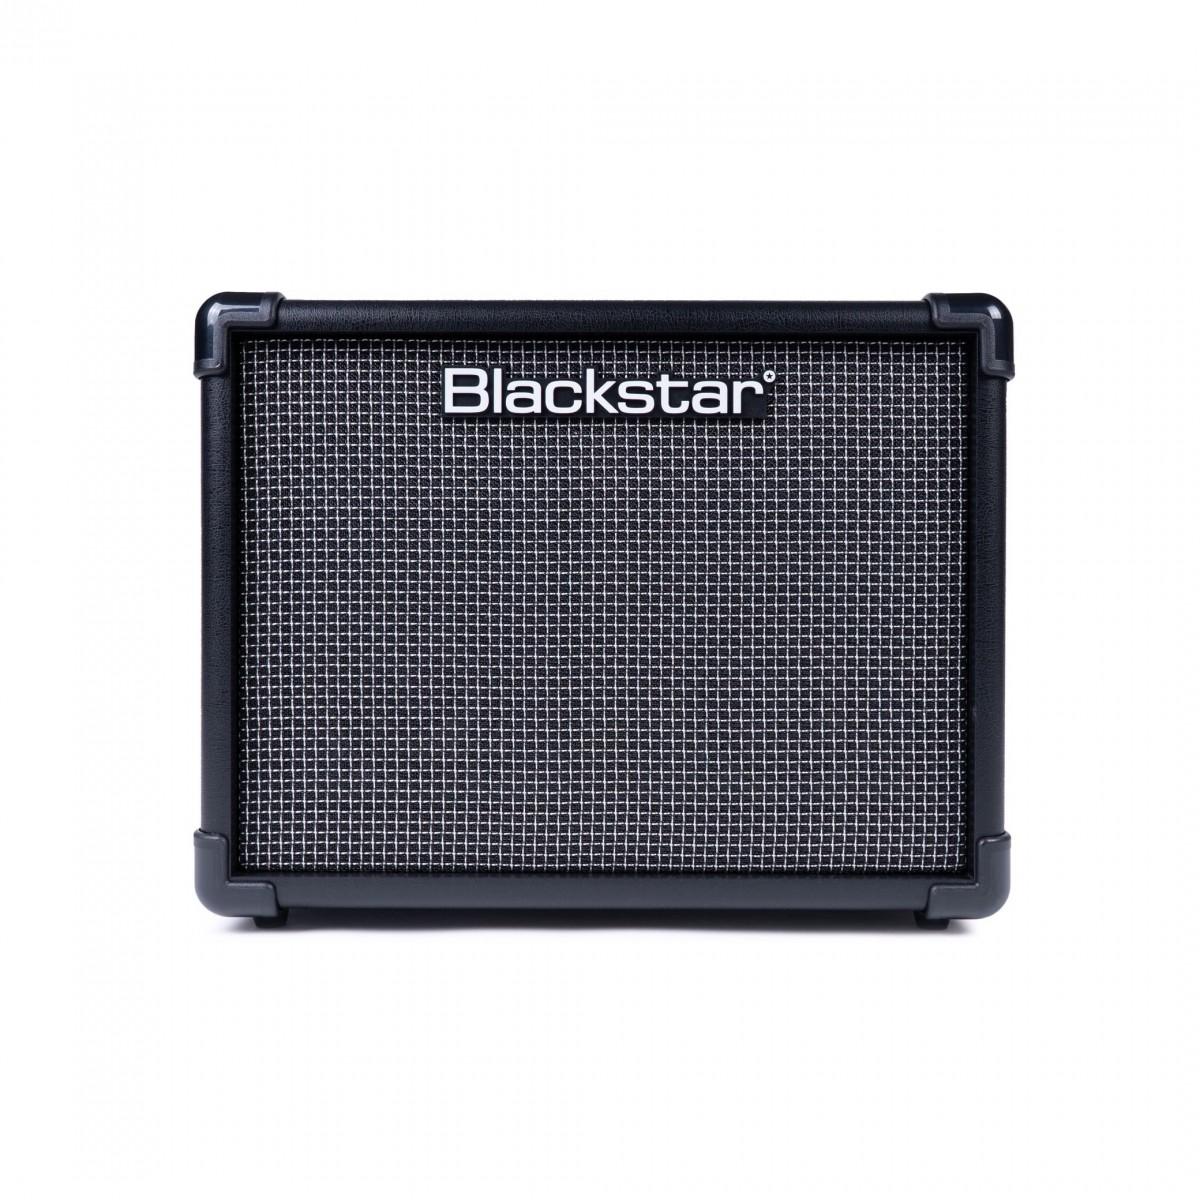 blackstar-idc-10v3-01